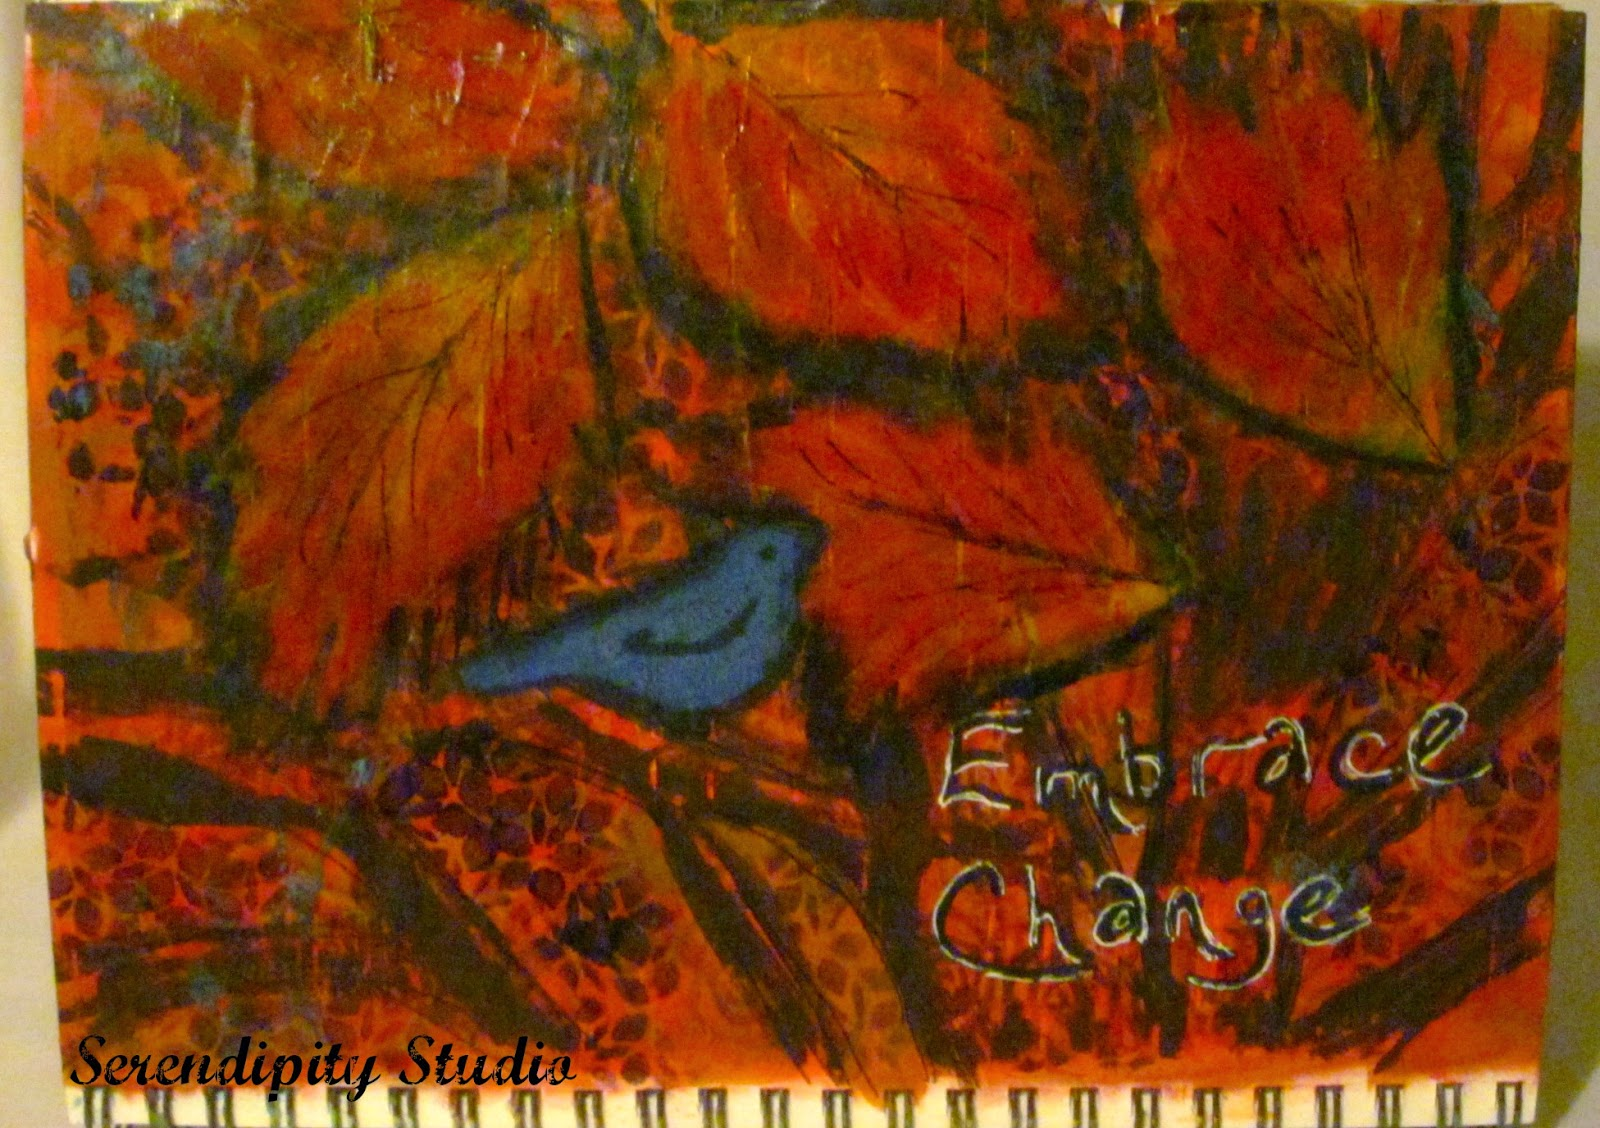 Art journal page, Embrace Change created by www.serendipitystudiobycw.blogspot.com